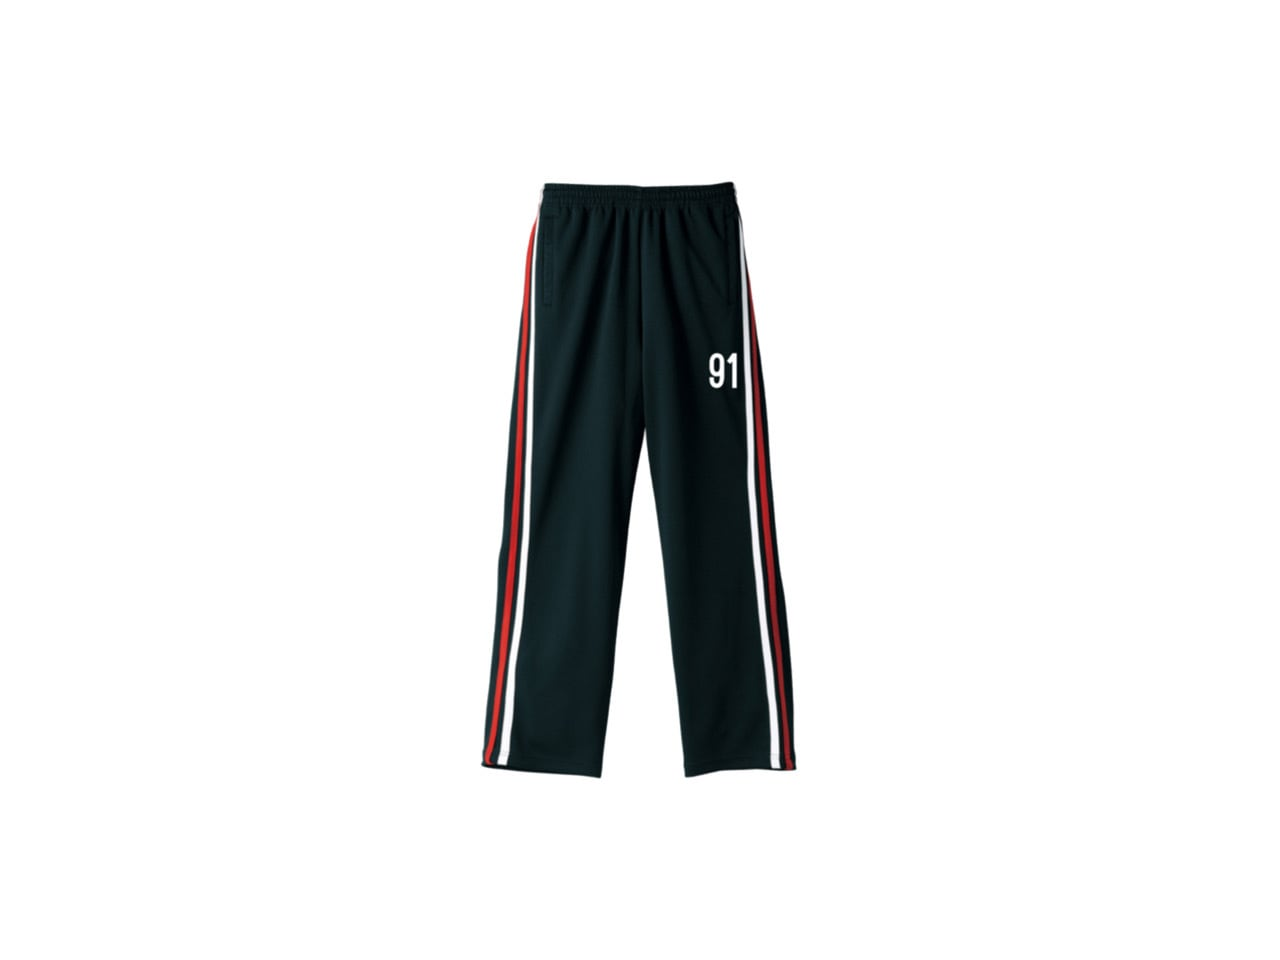 coguchi 91s dry pants (BLK/RED/WH)